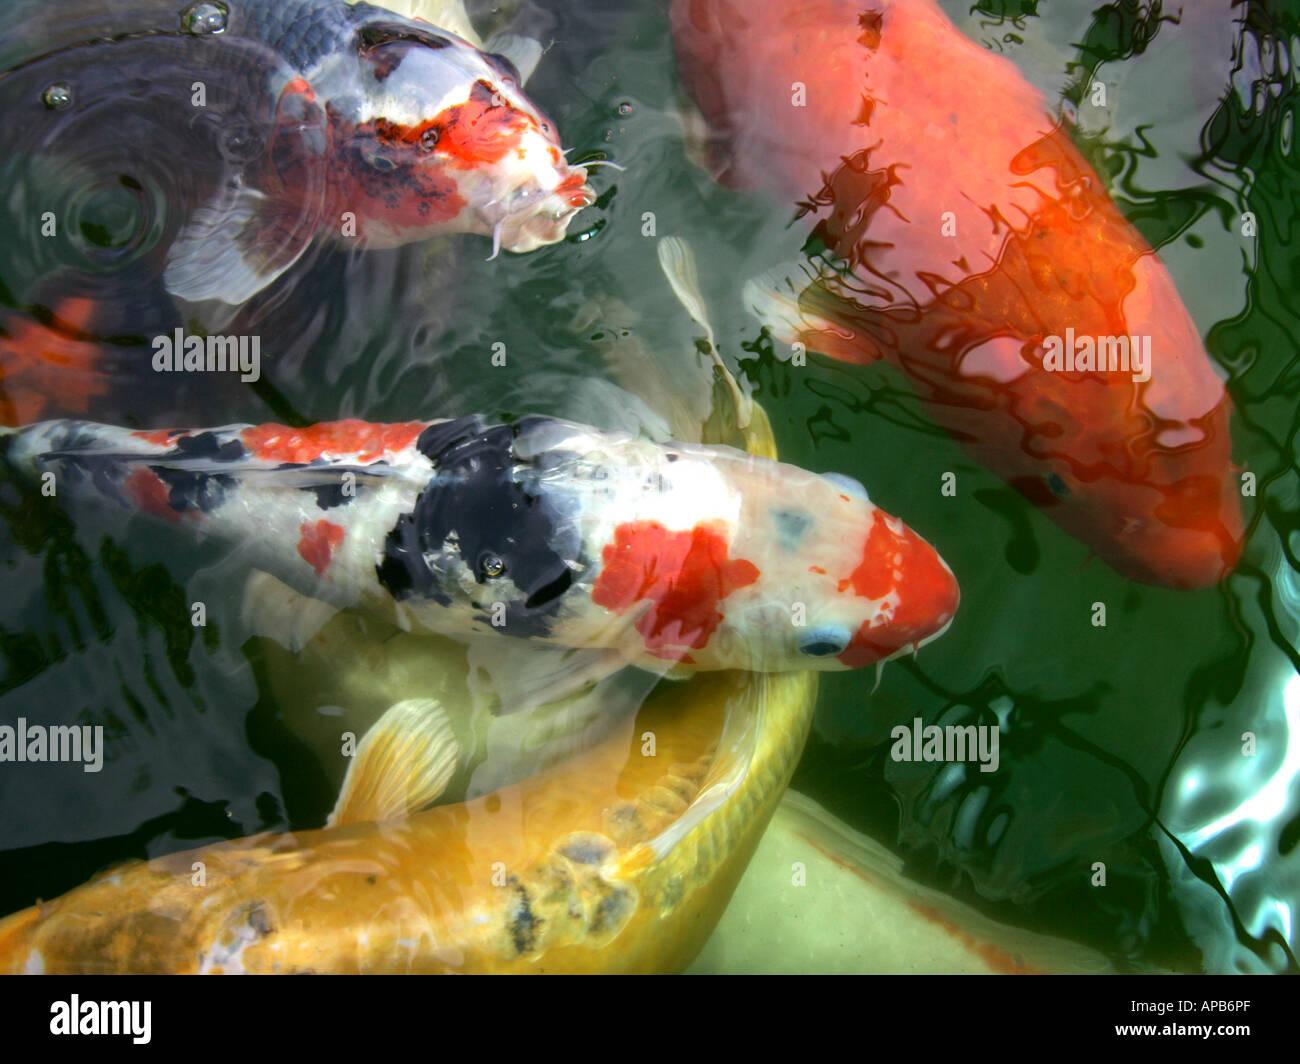 Koi carp swimming. - Stock Image